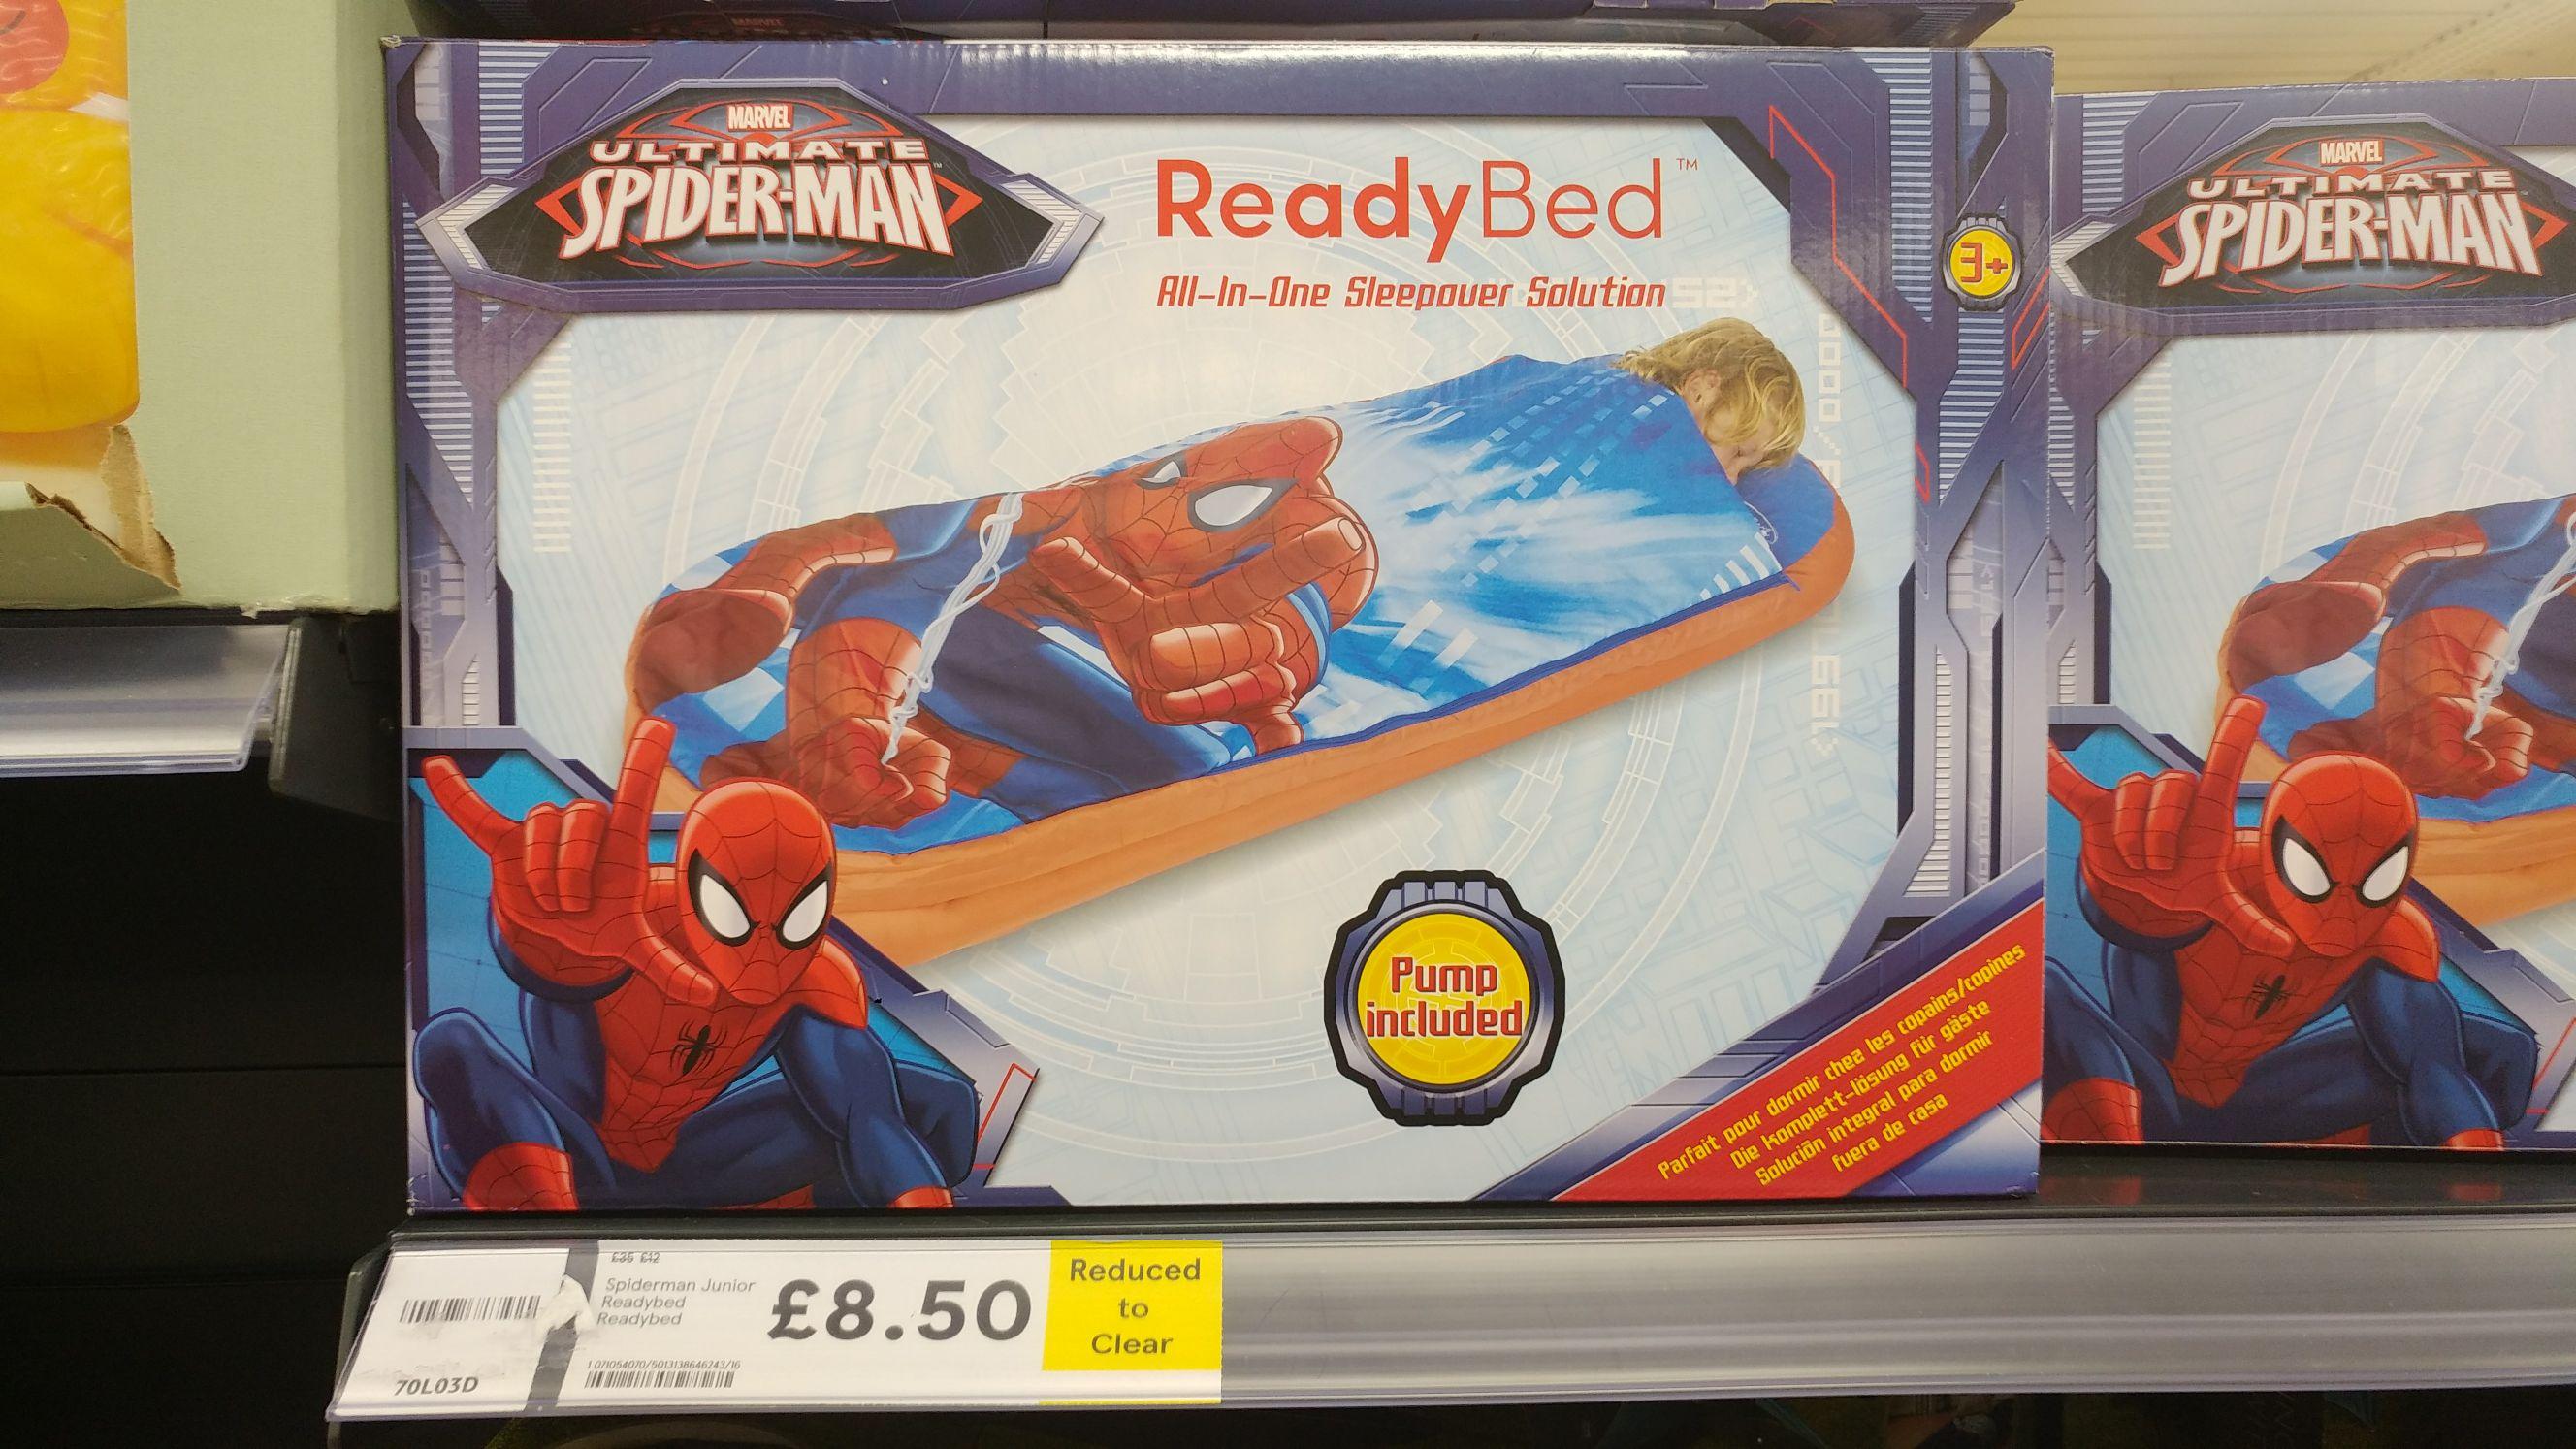 Spider-Man Junior Readybed £8.50 @ Tesco Kingston MK (INSTORE) RRP £35